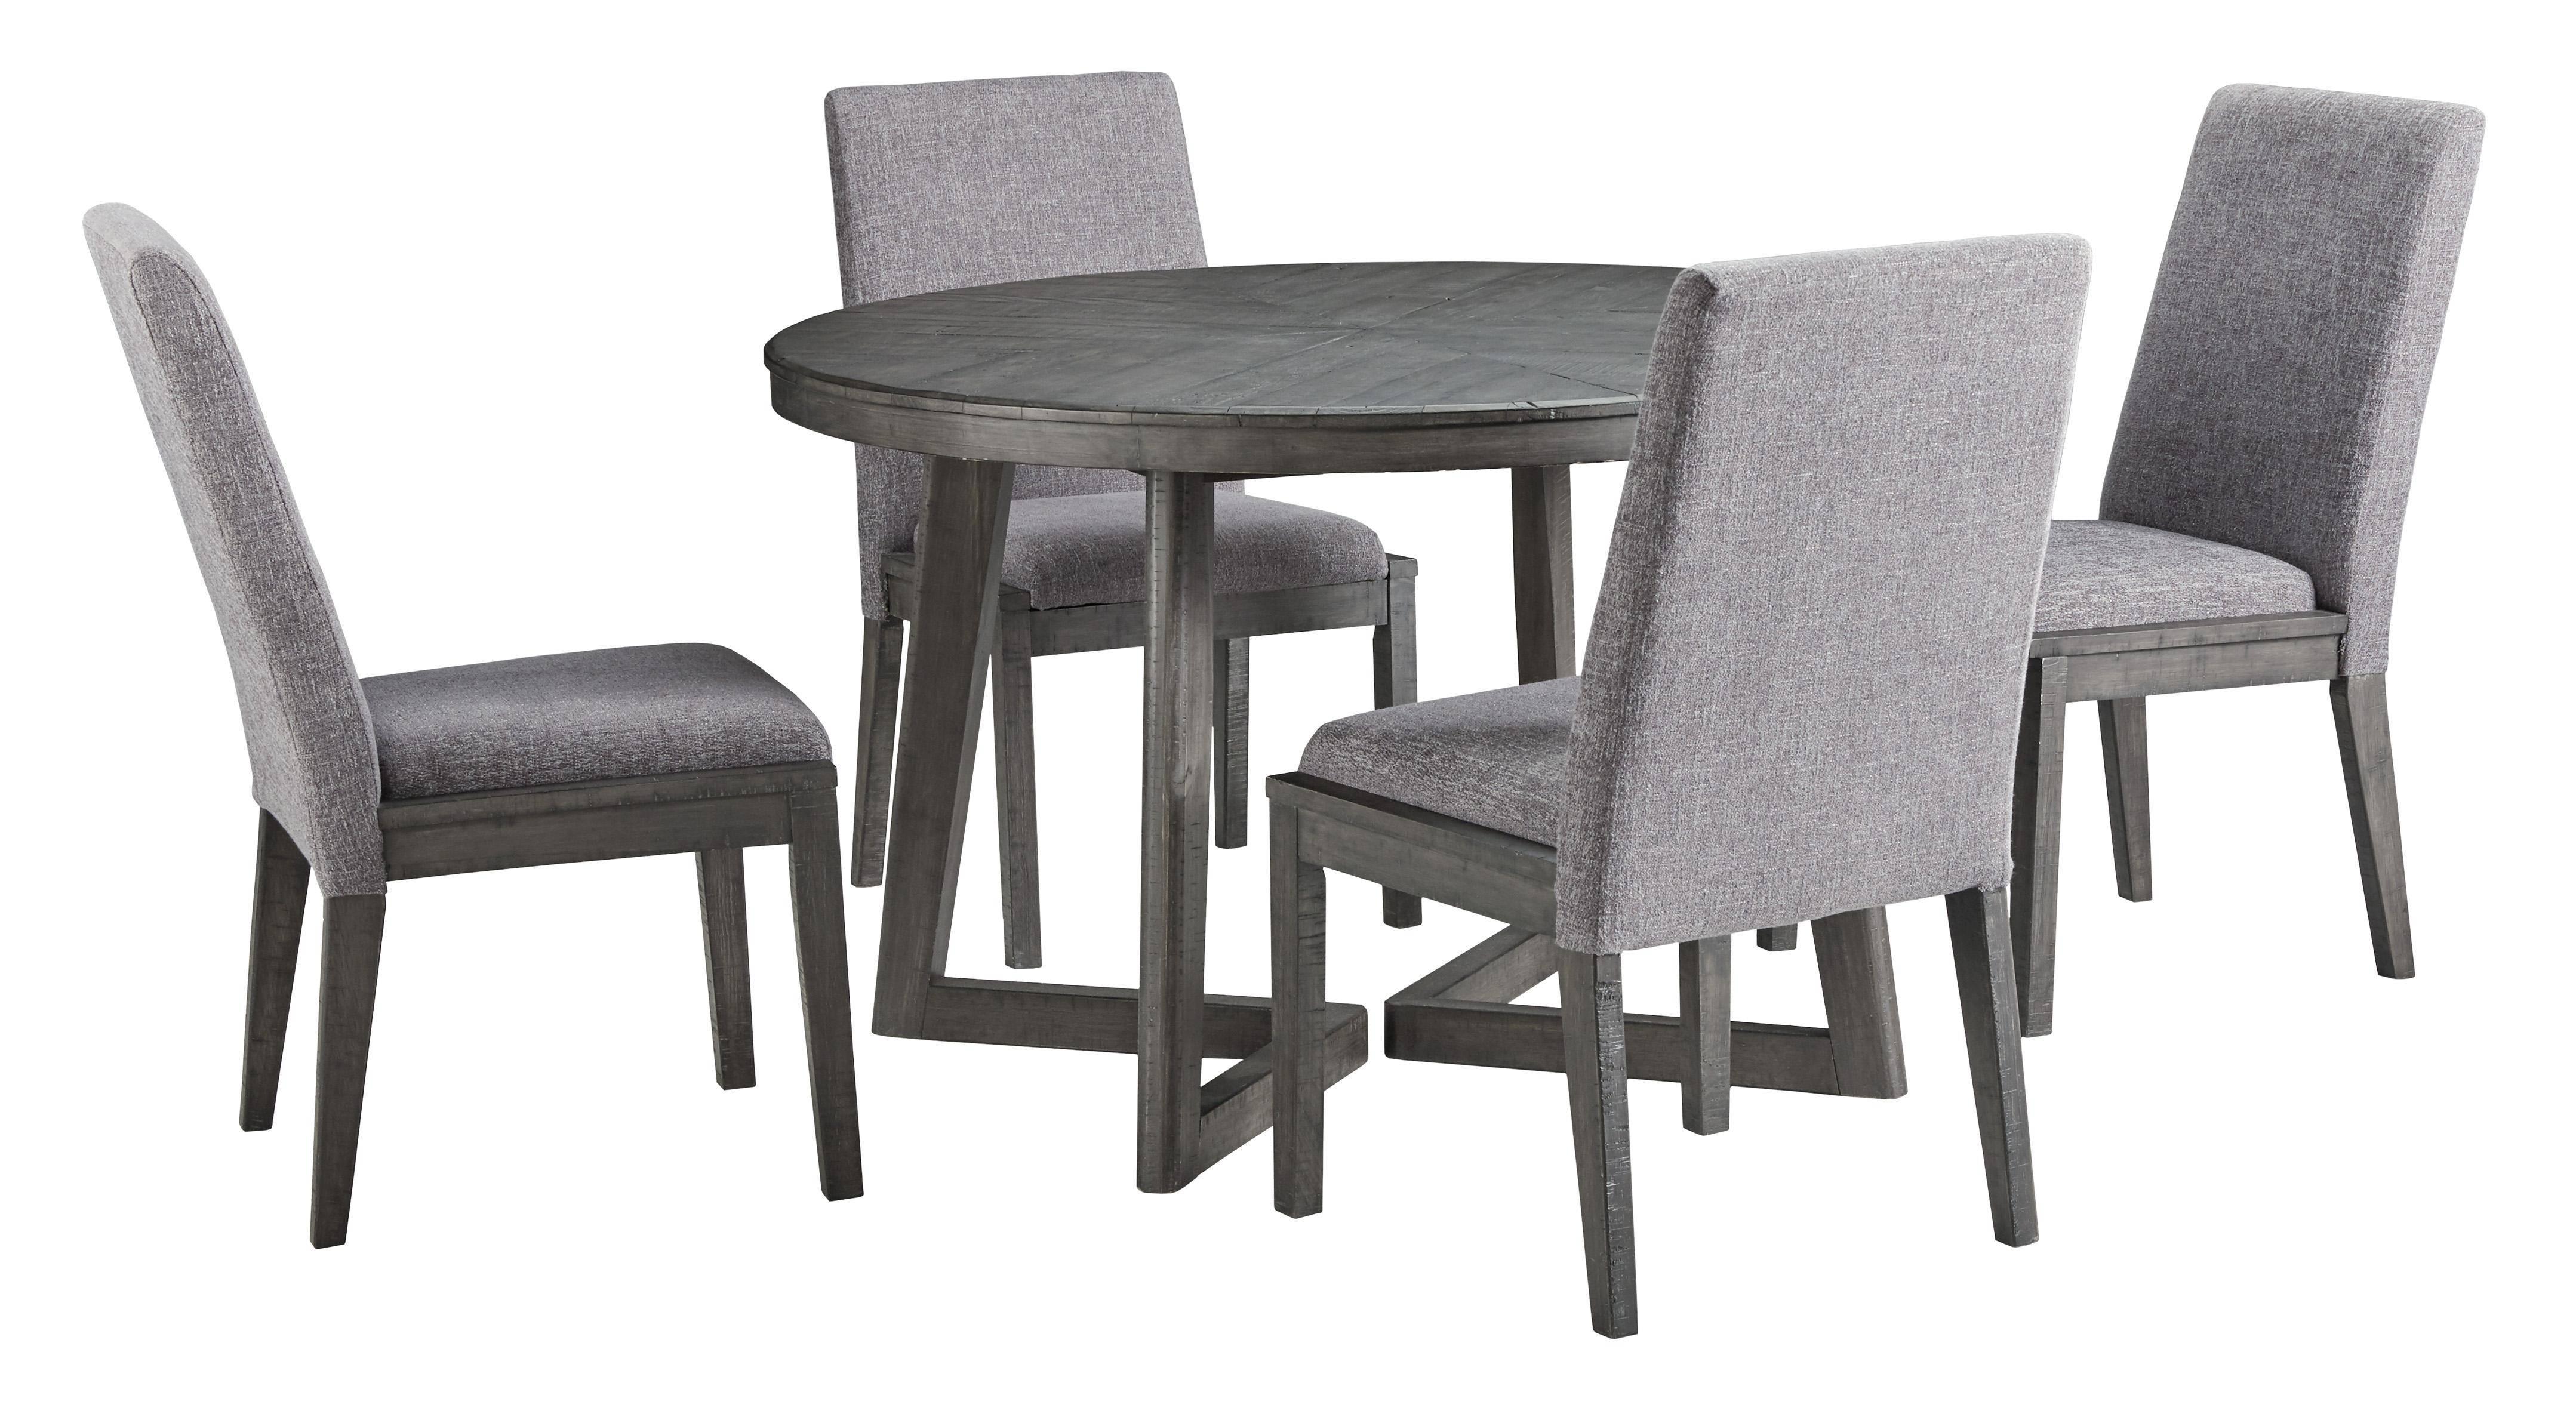 Nationwide Furniture Outlet